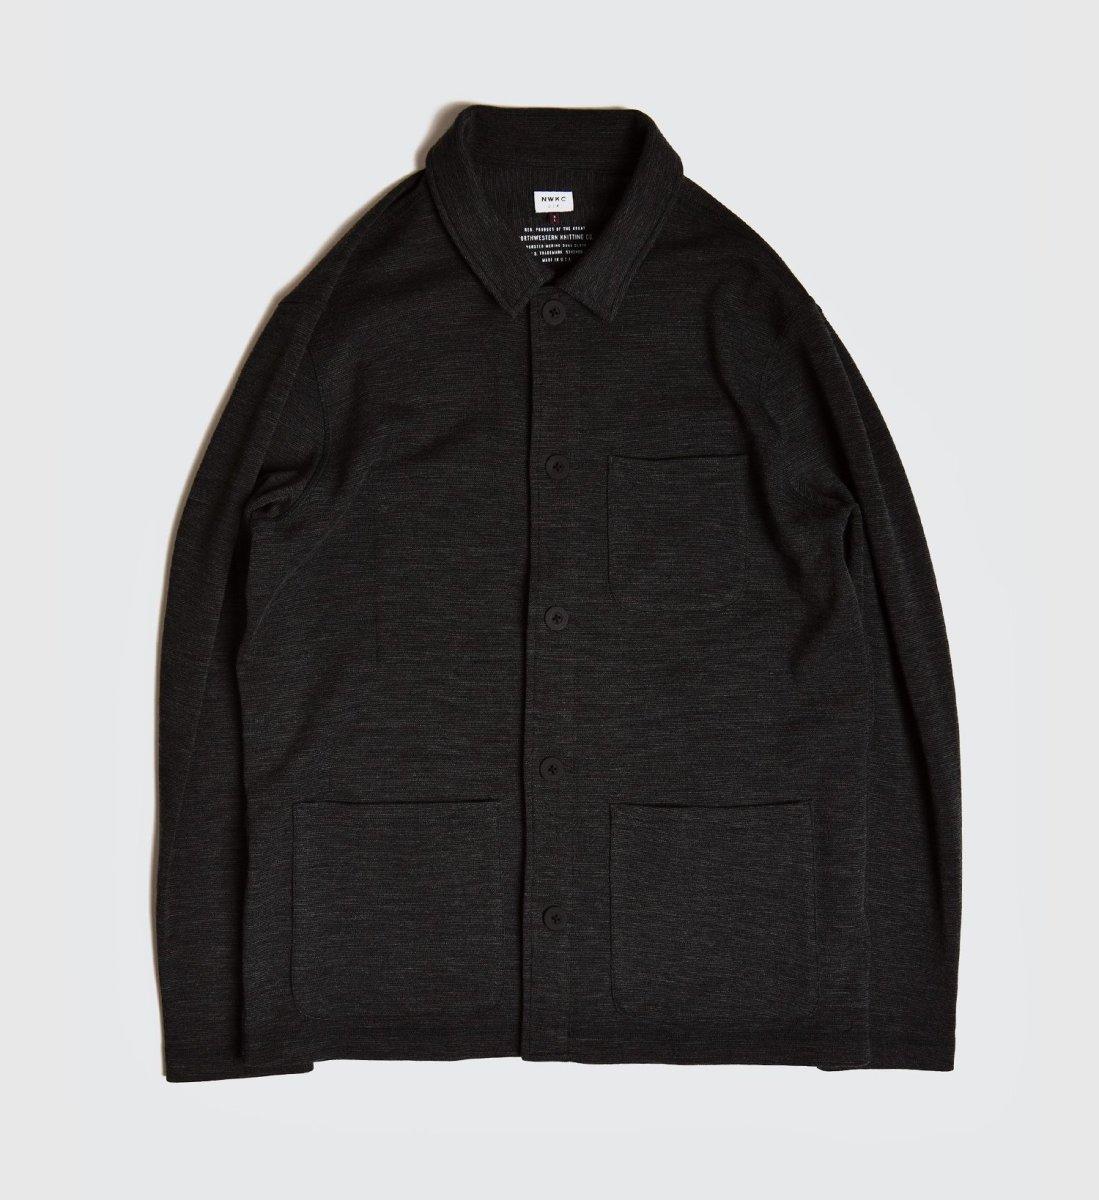 NWKC Chore Coat